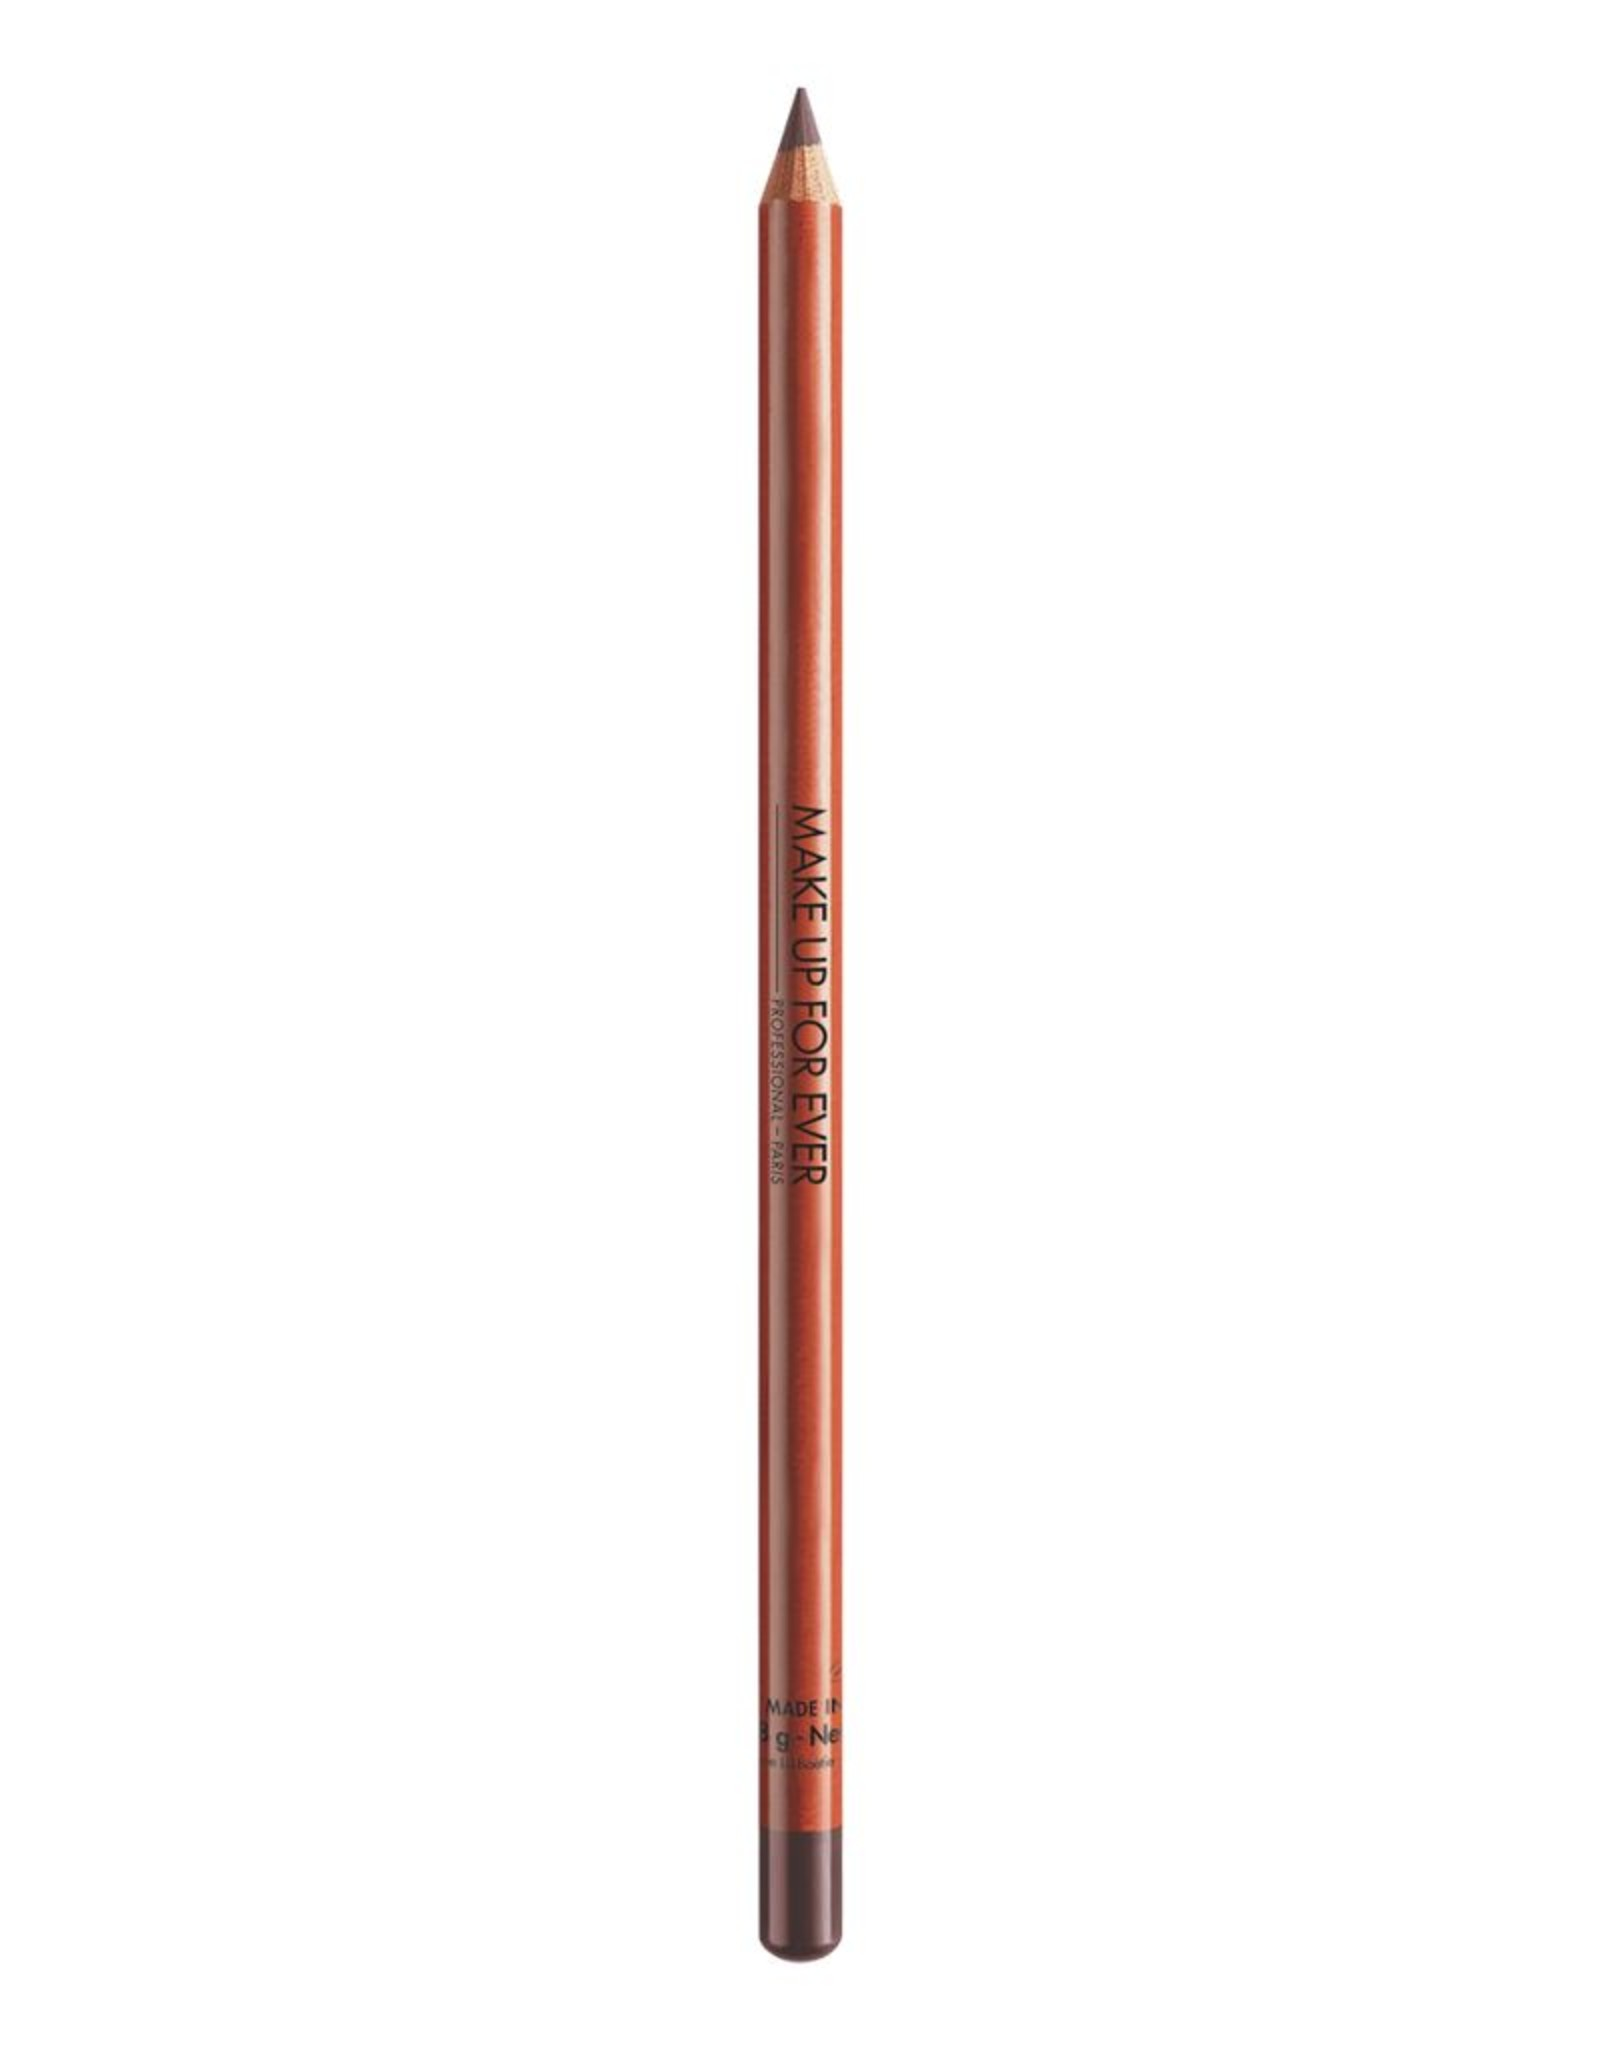 MUFE CRAYON LEVRES 1,8g N24 bordeaux fonce /  dark burgundy